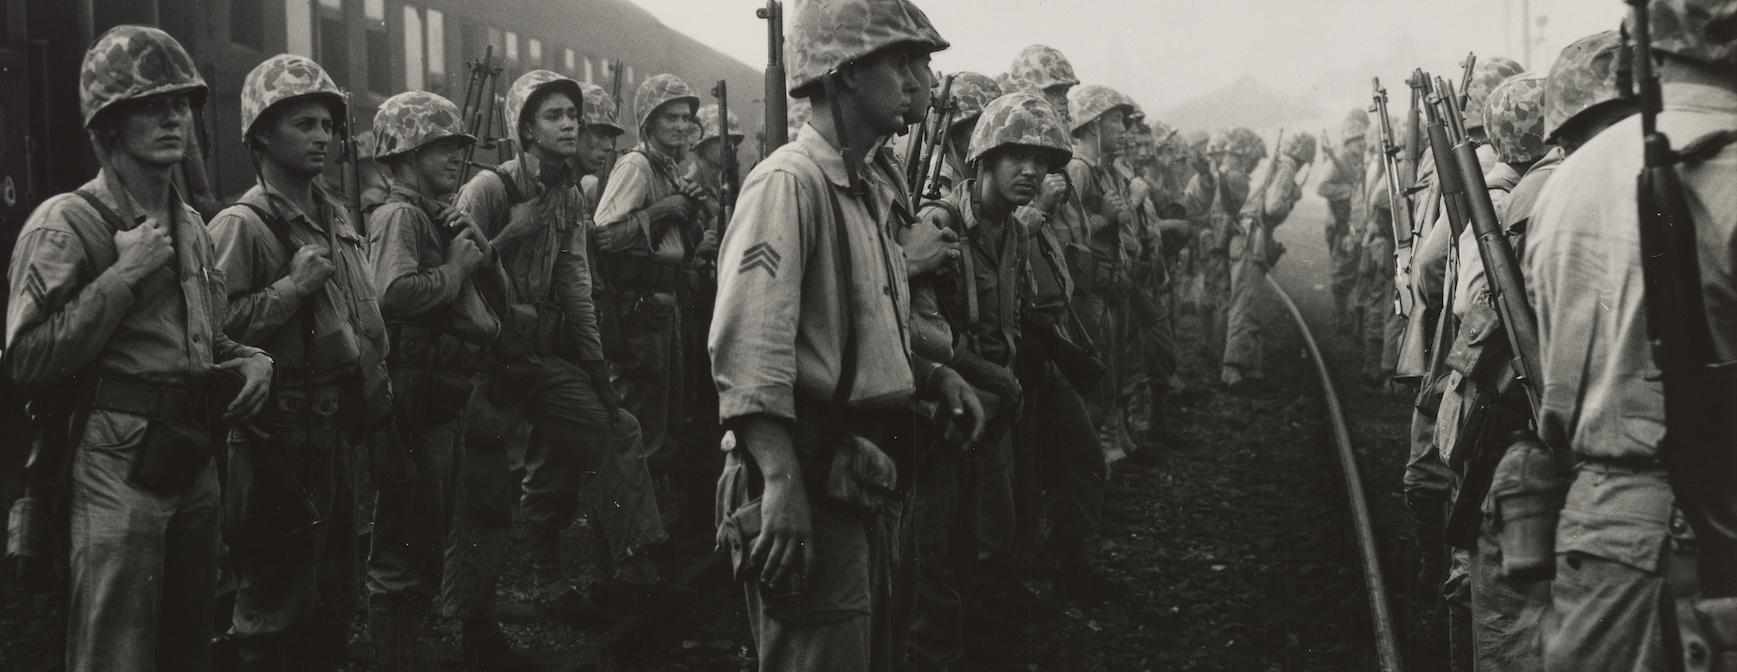 Korean War: 3rd platoon of D Co, 2nd Bn, 5th marines muster